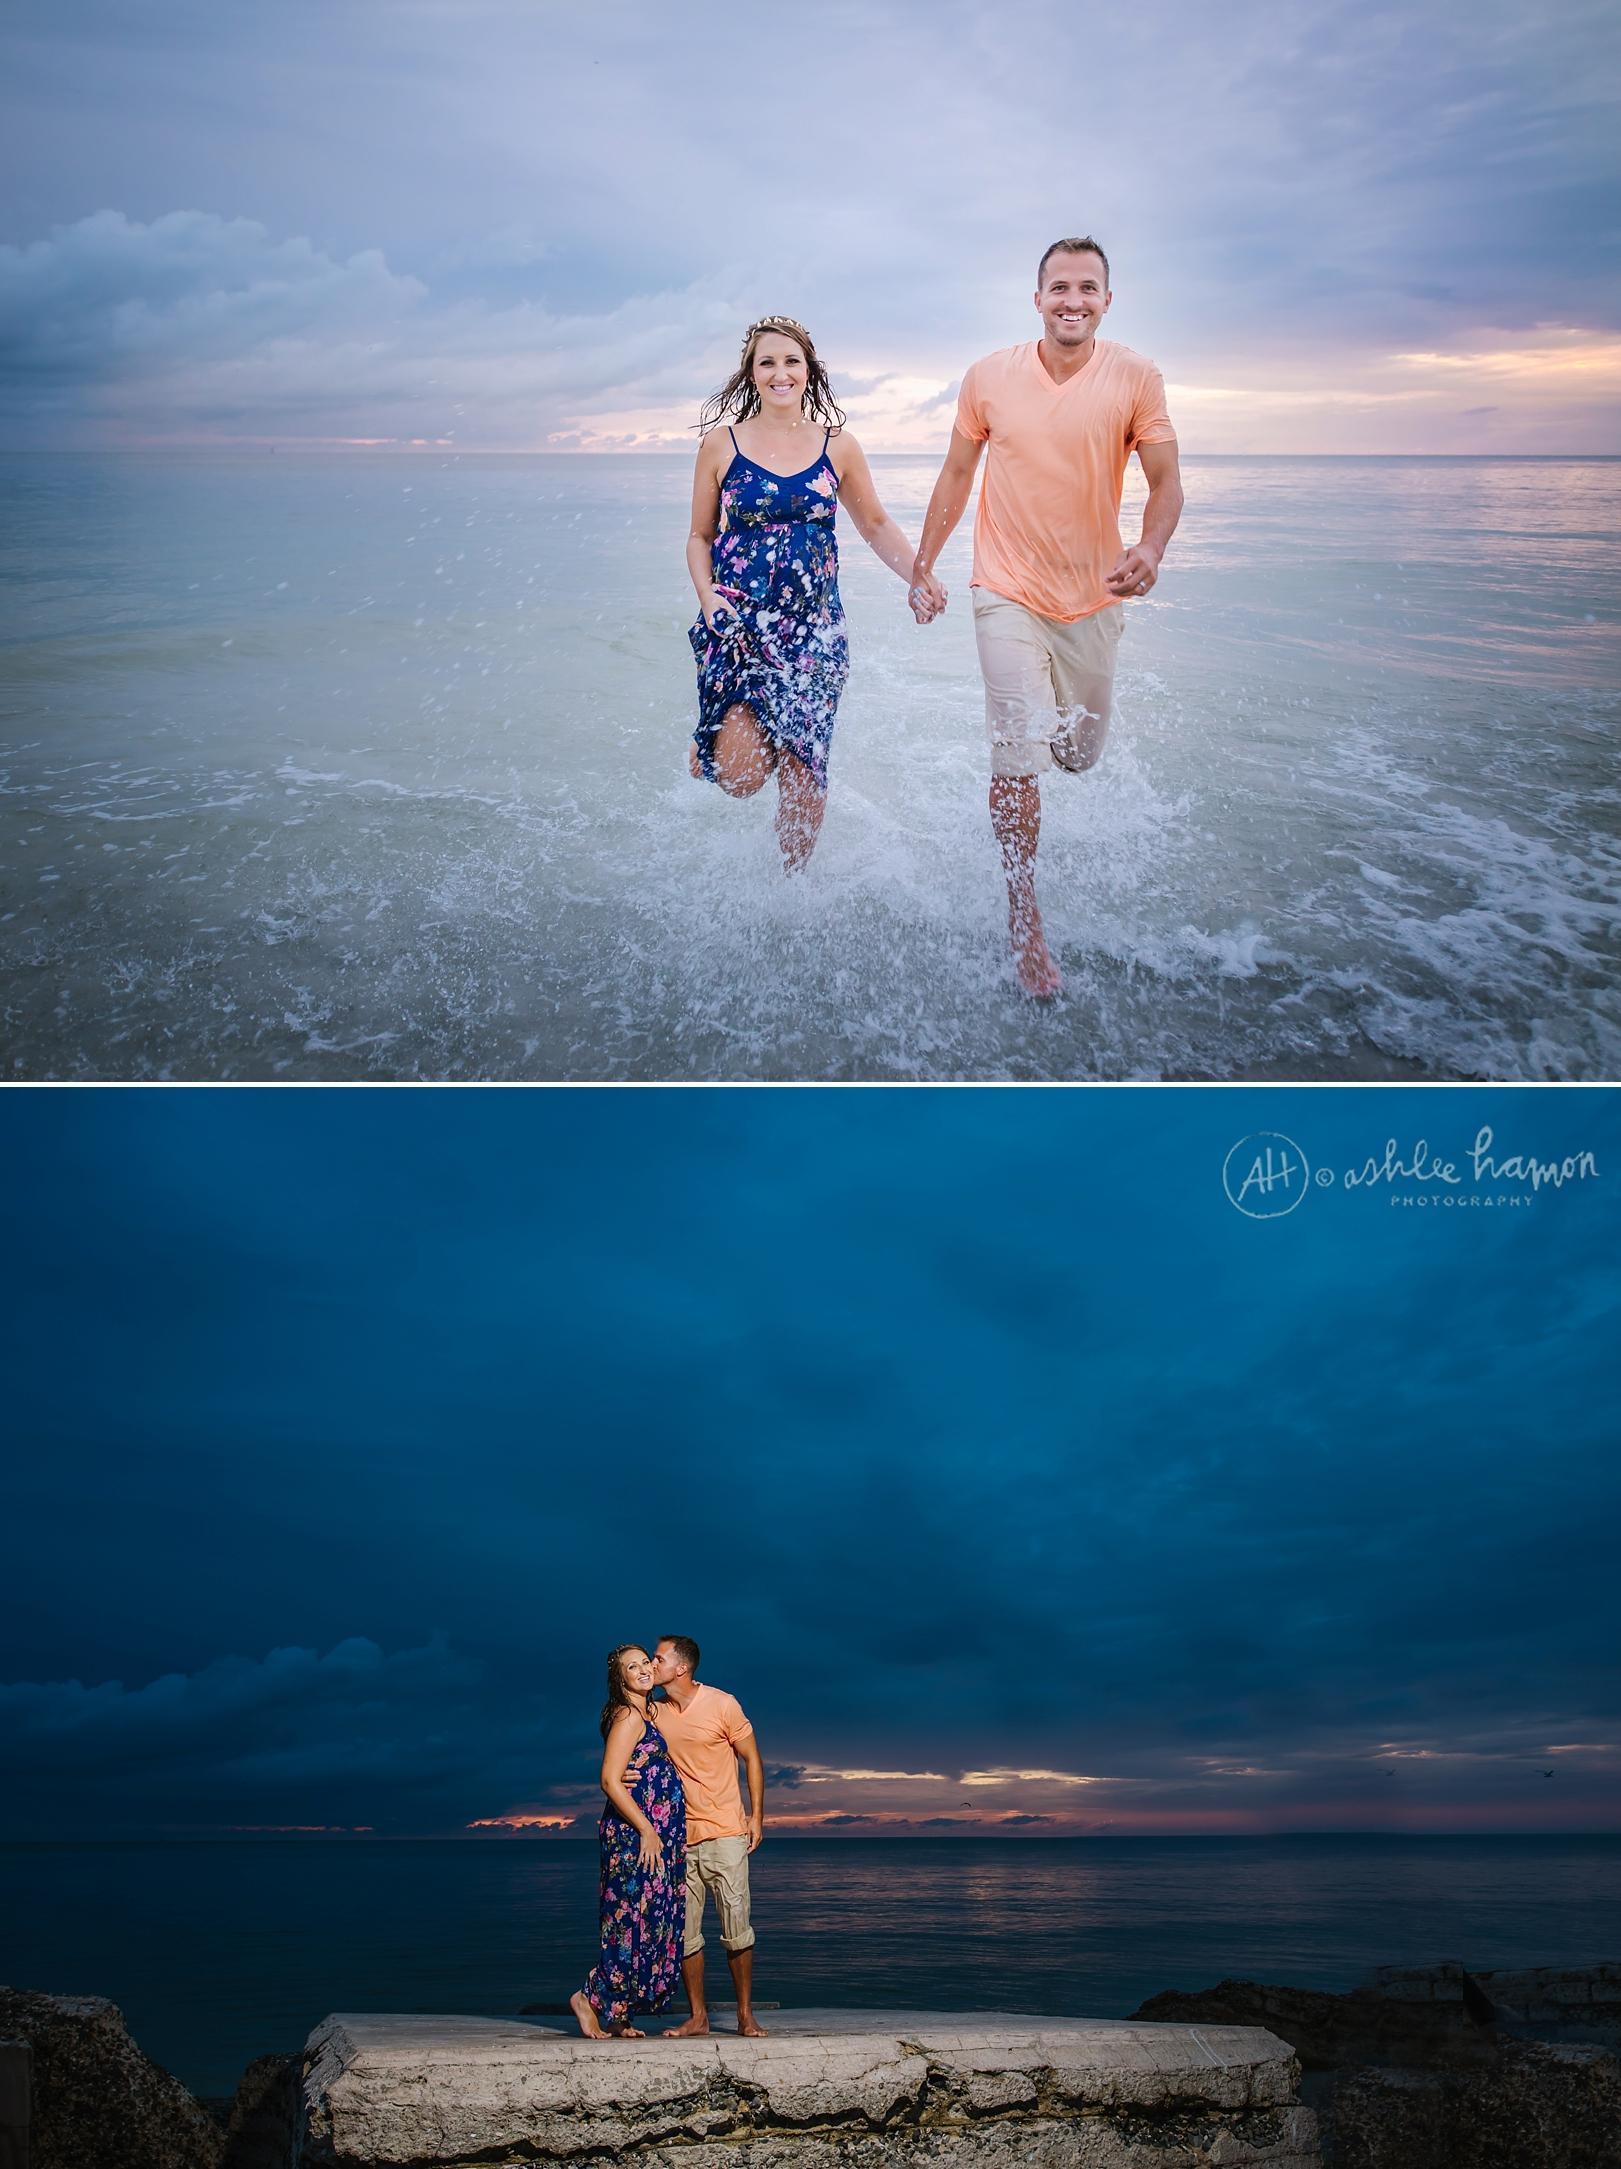 tampa-maternity-photography-ashlee-hamon-beach_0008.jpg